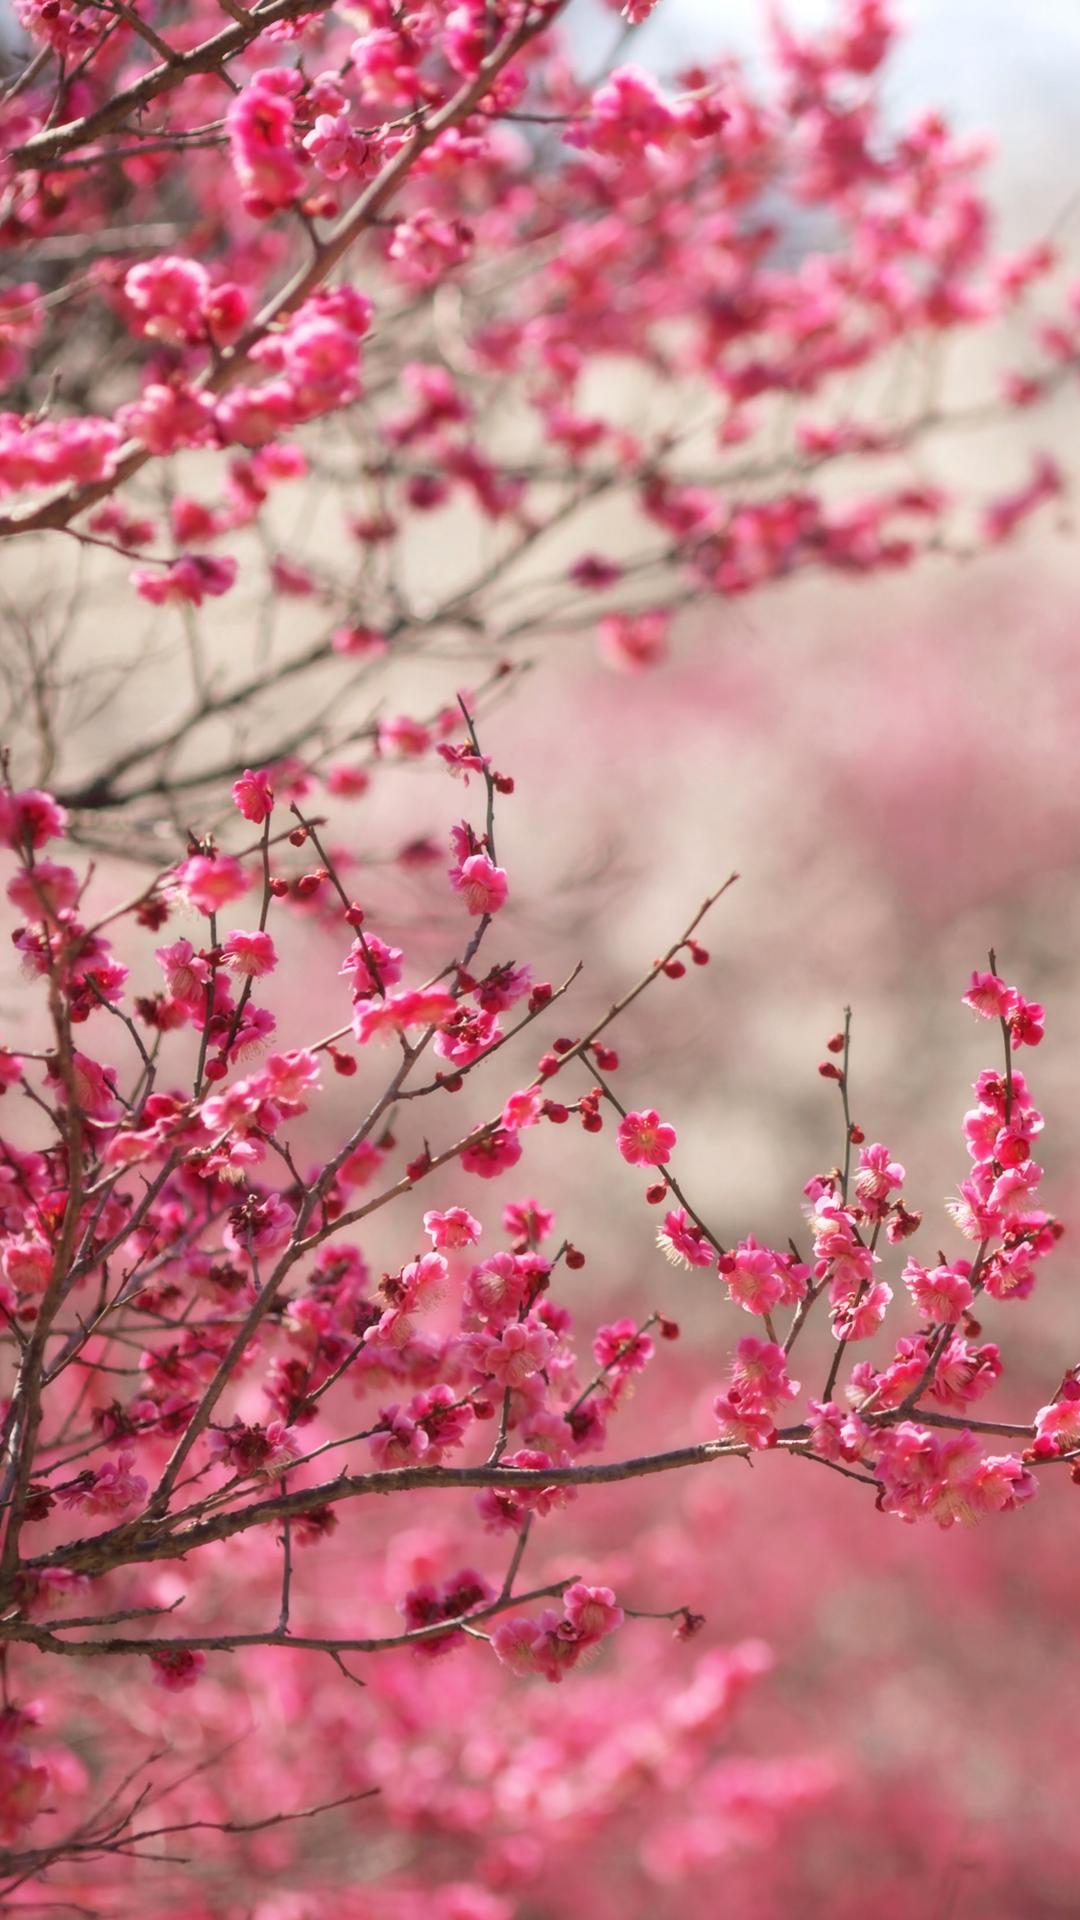 Sfondi iphone fiori rosa